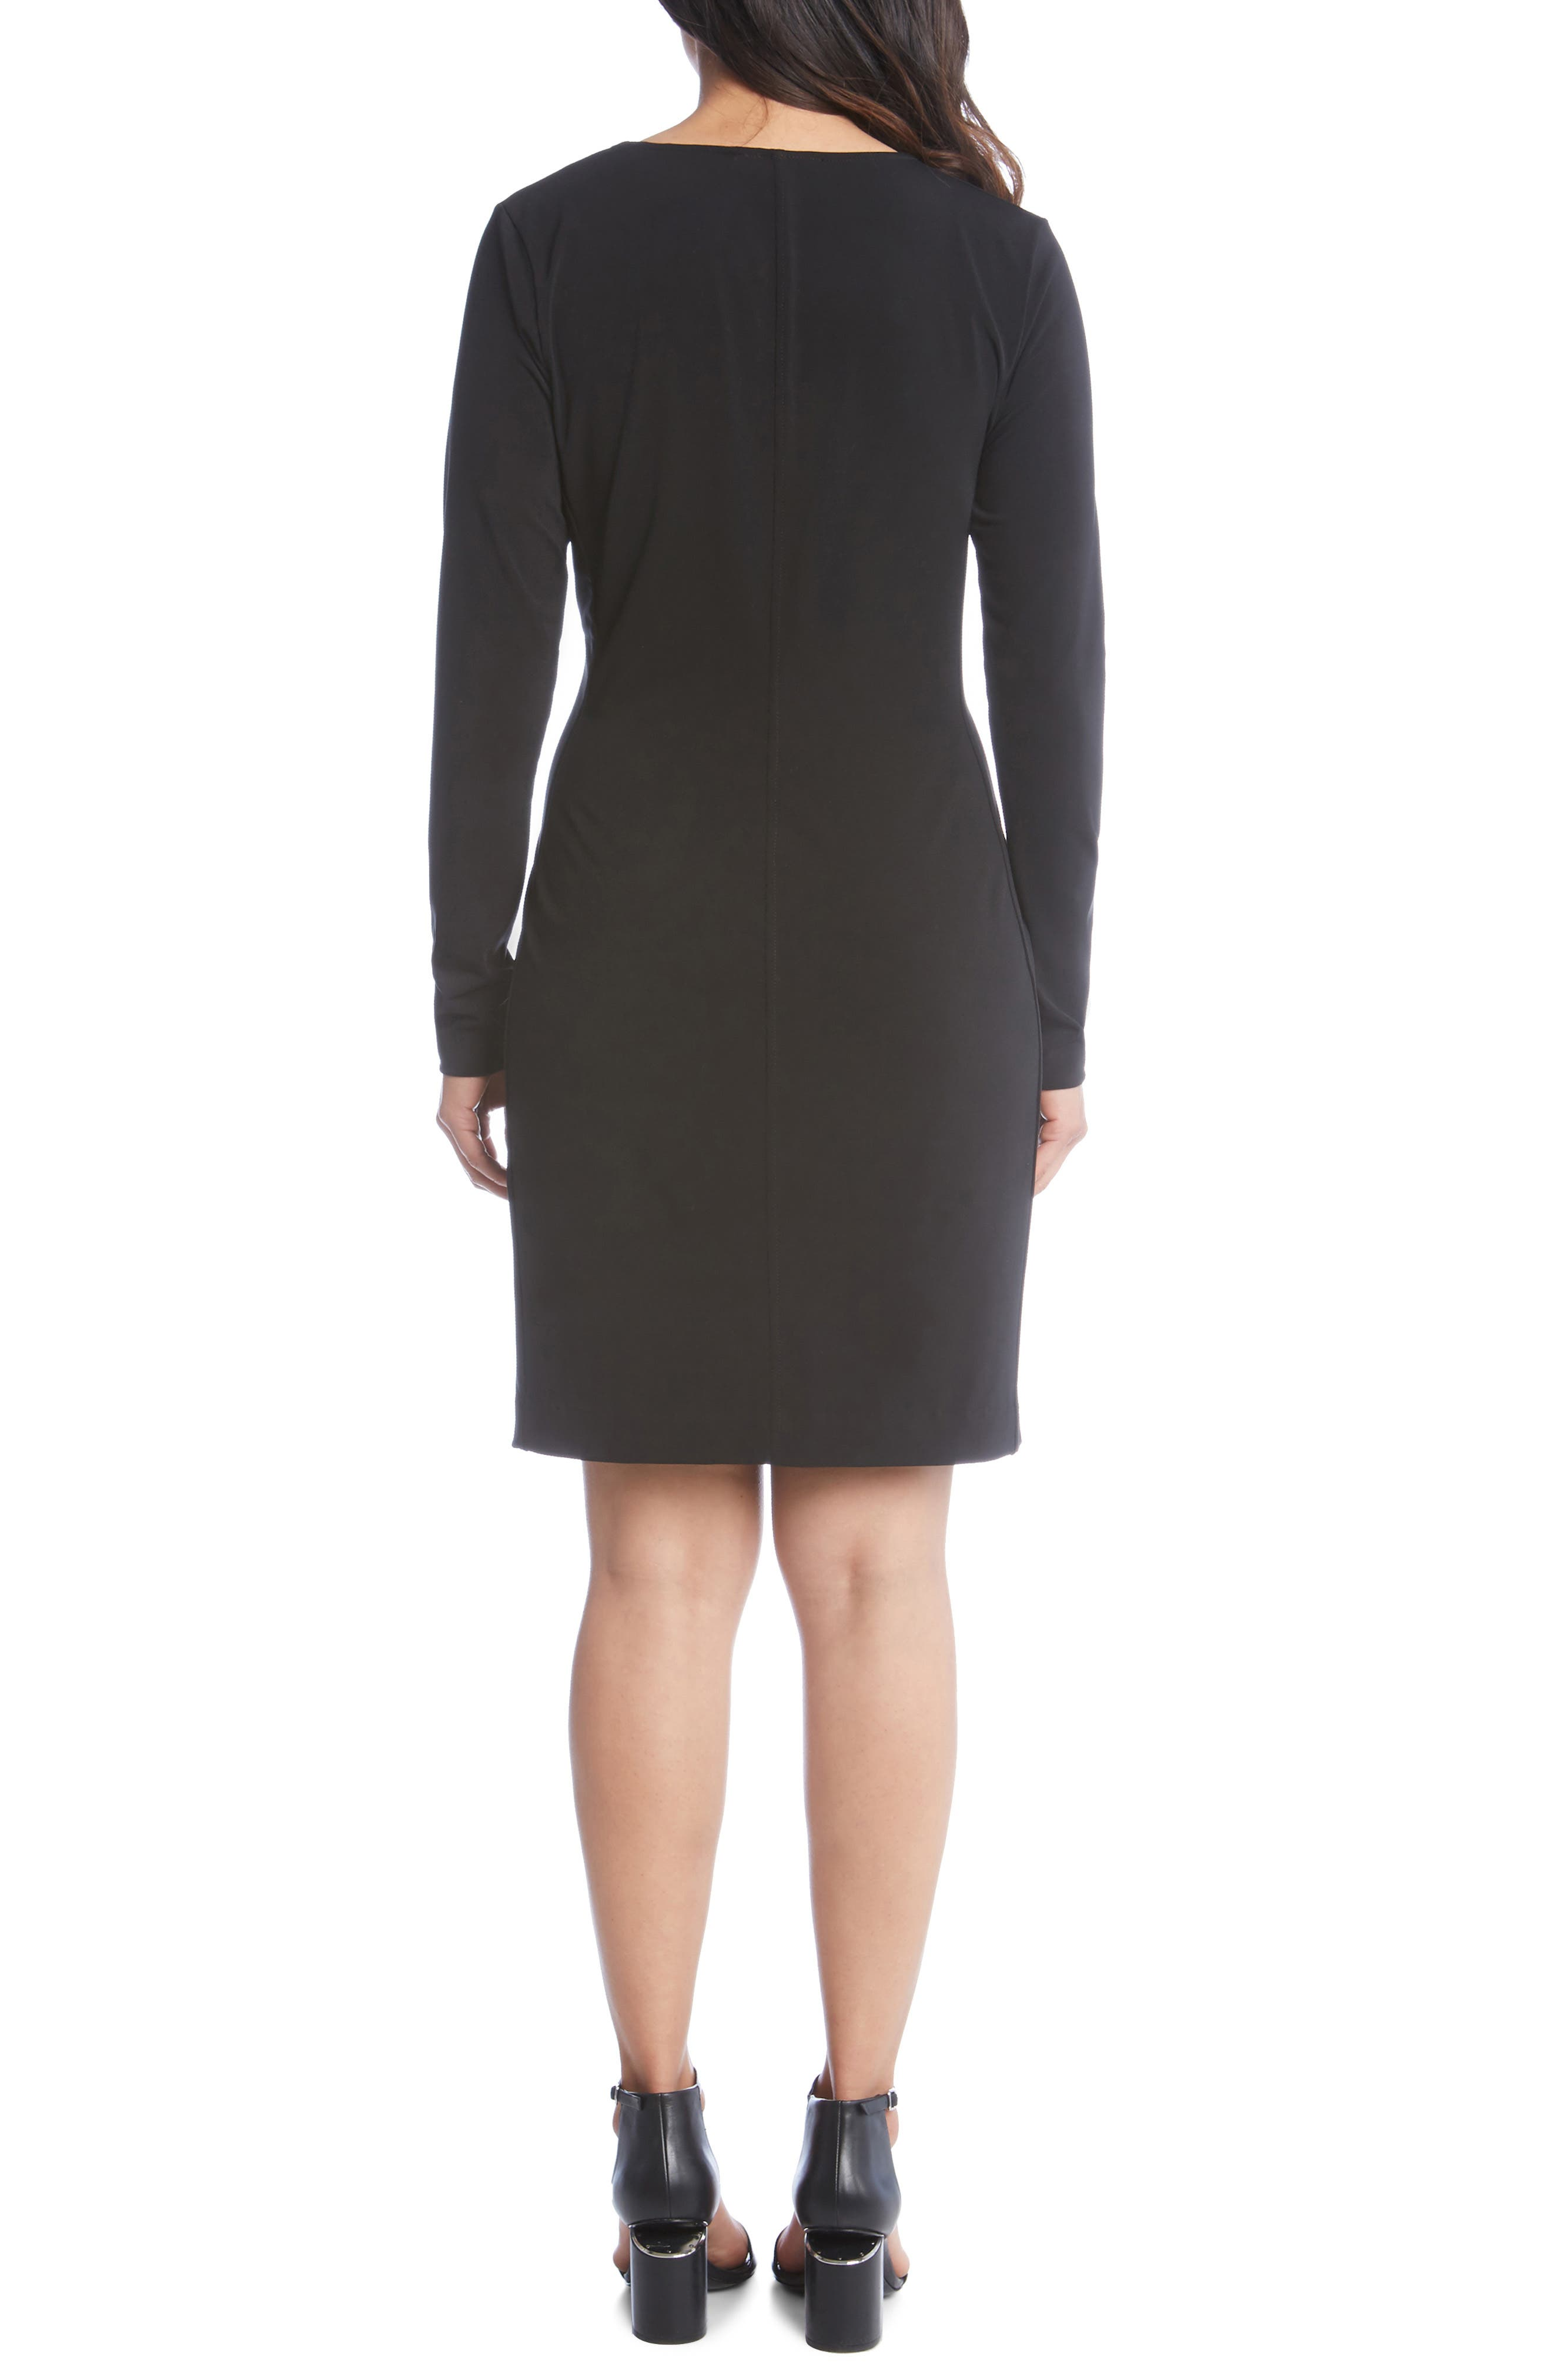 KAREN KANE, Faux Wrap Dress, Alternate thumbnail 2, color, BLACK